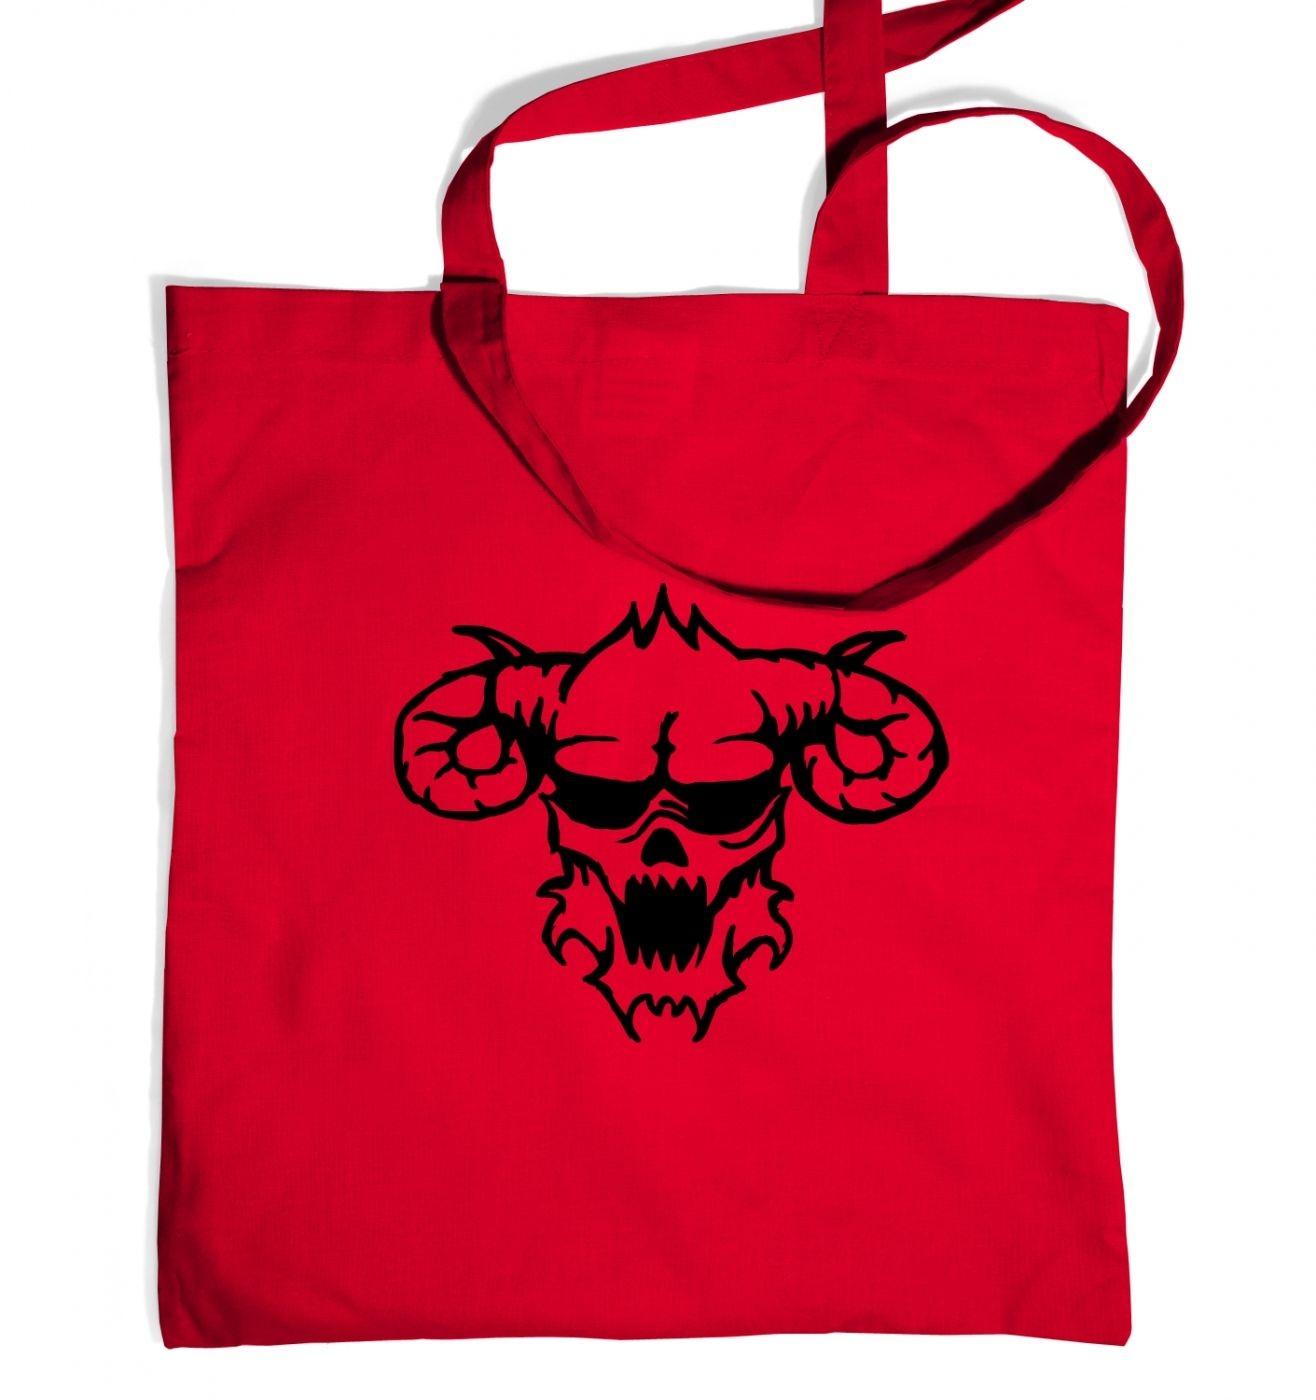 Black Outline Demon's Head tote bag